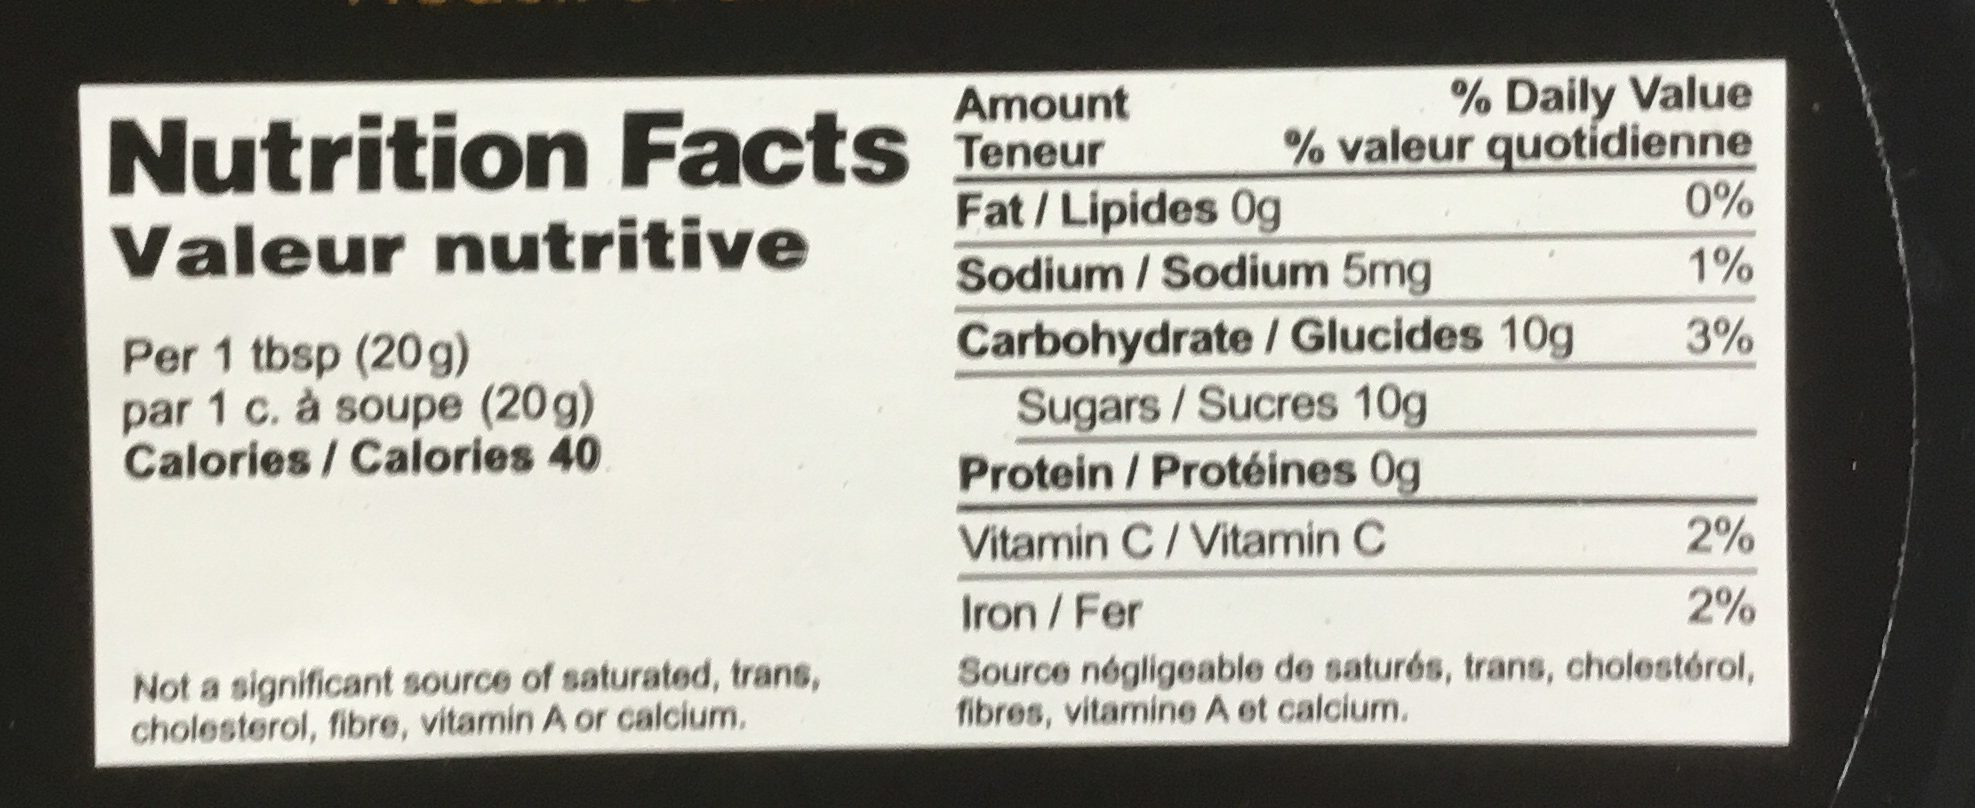 Marmelade aux figues - Informations nutritionnelles